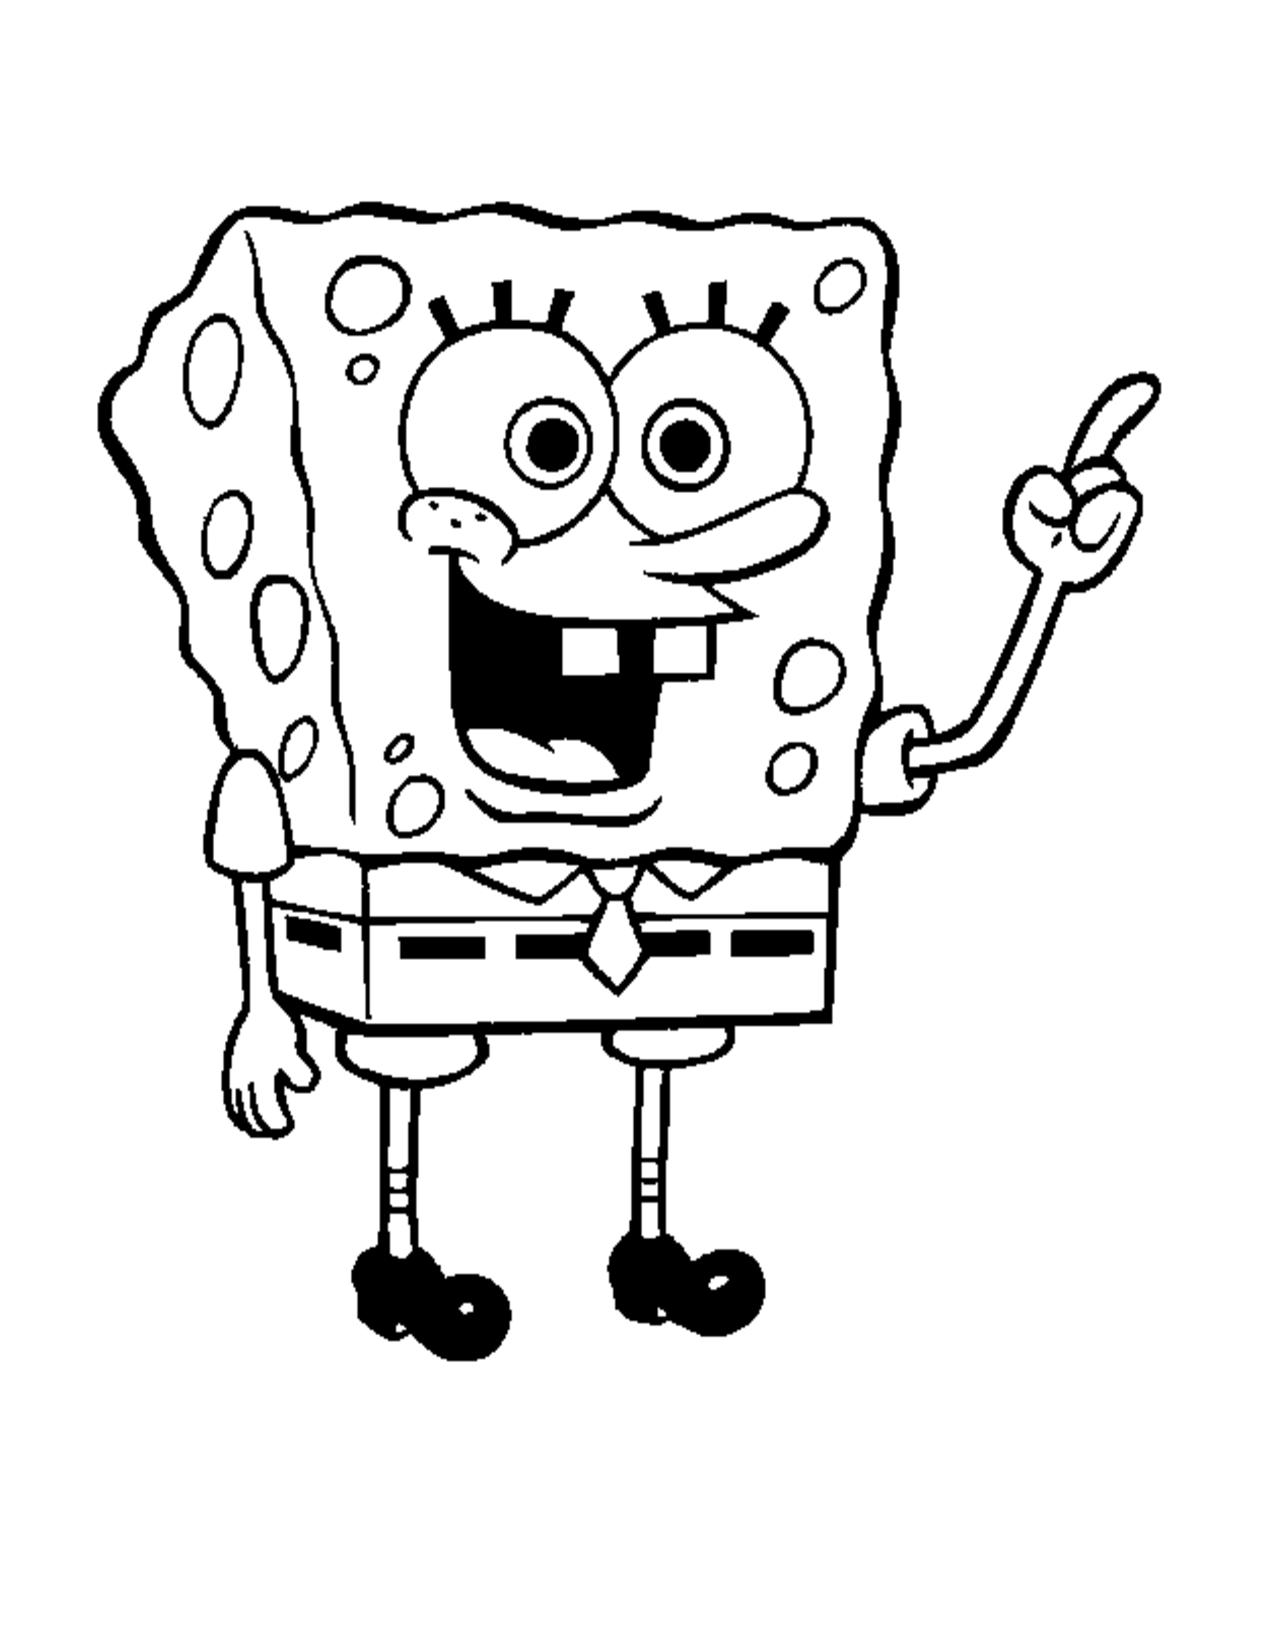 Spongebob-coloring-sheets | 17th-18th CENTURY FASHION | Pinterest ...